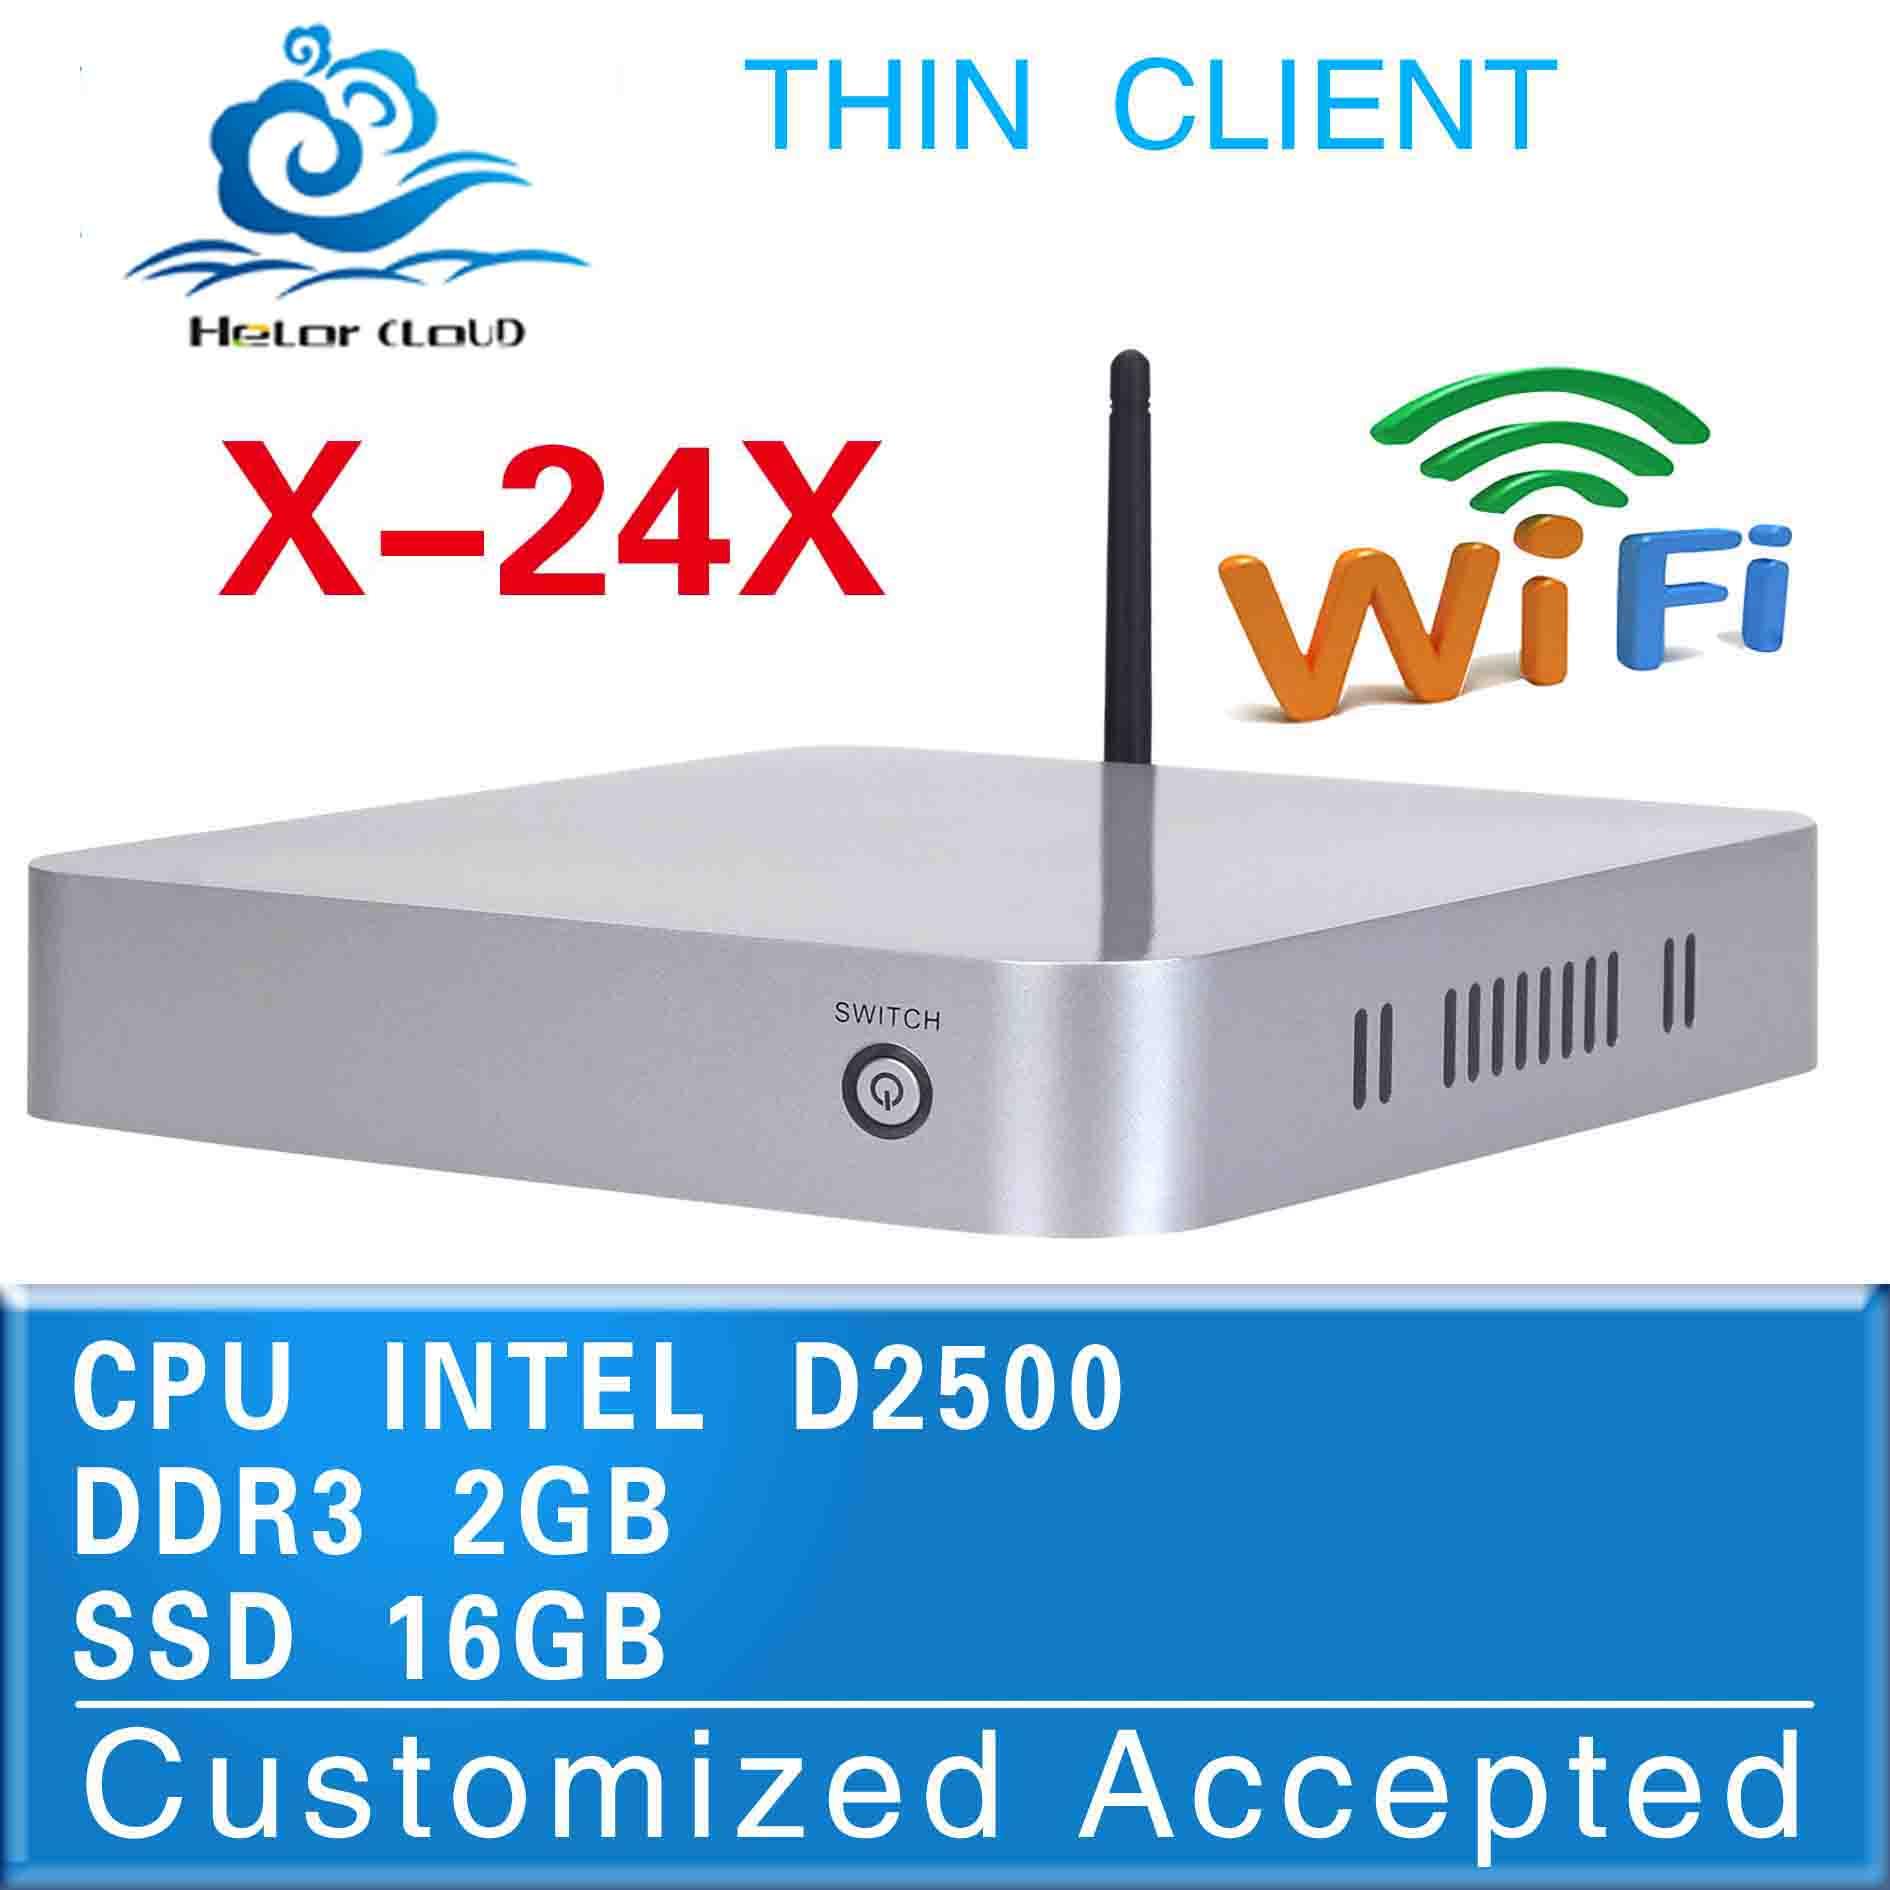 low power low heat mini computer x-24x fan mini pc D2500 network industrial pc 2g ram 16g ssd thin client build-in-wifi pc(China (Mainland))